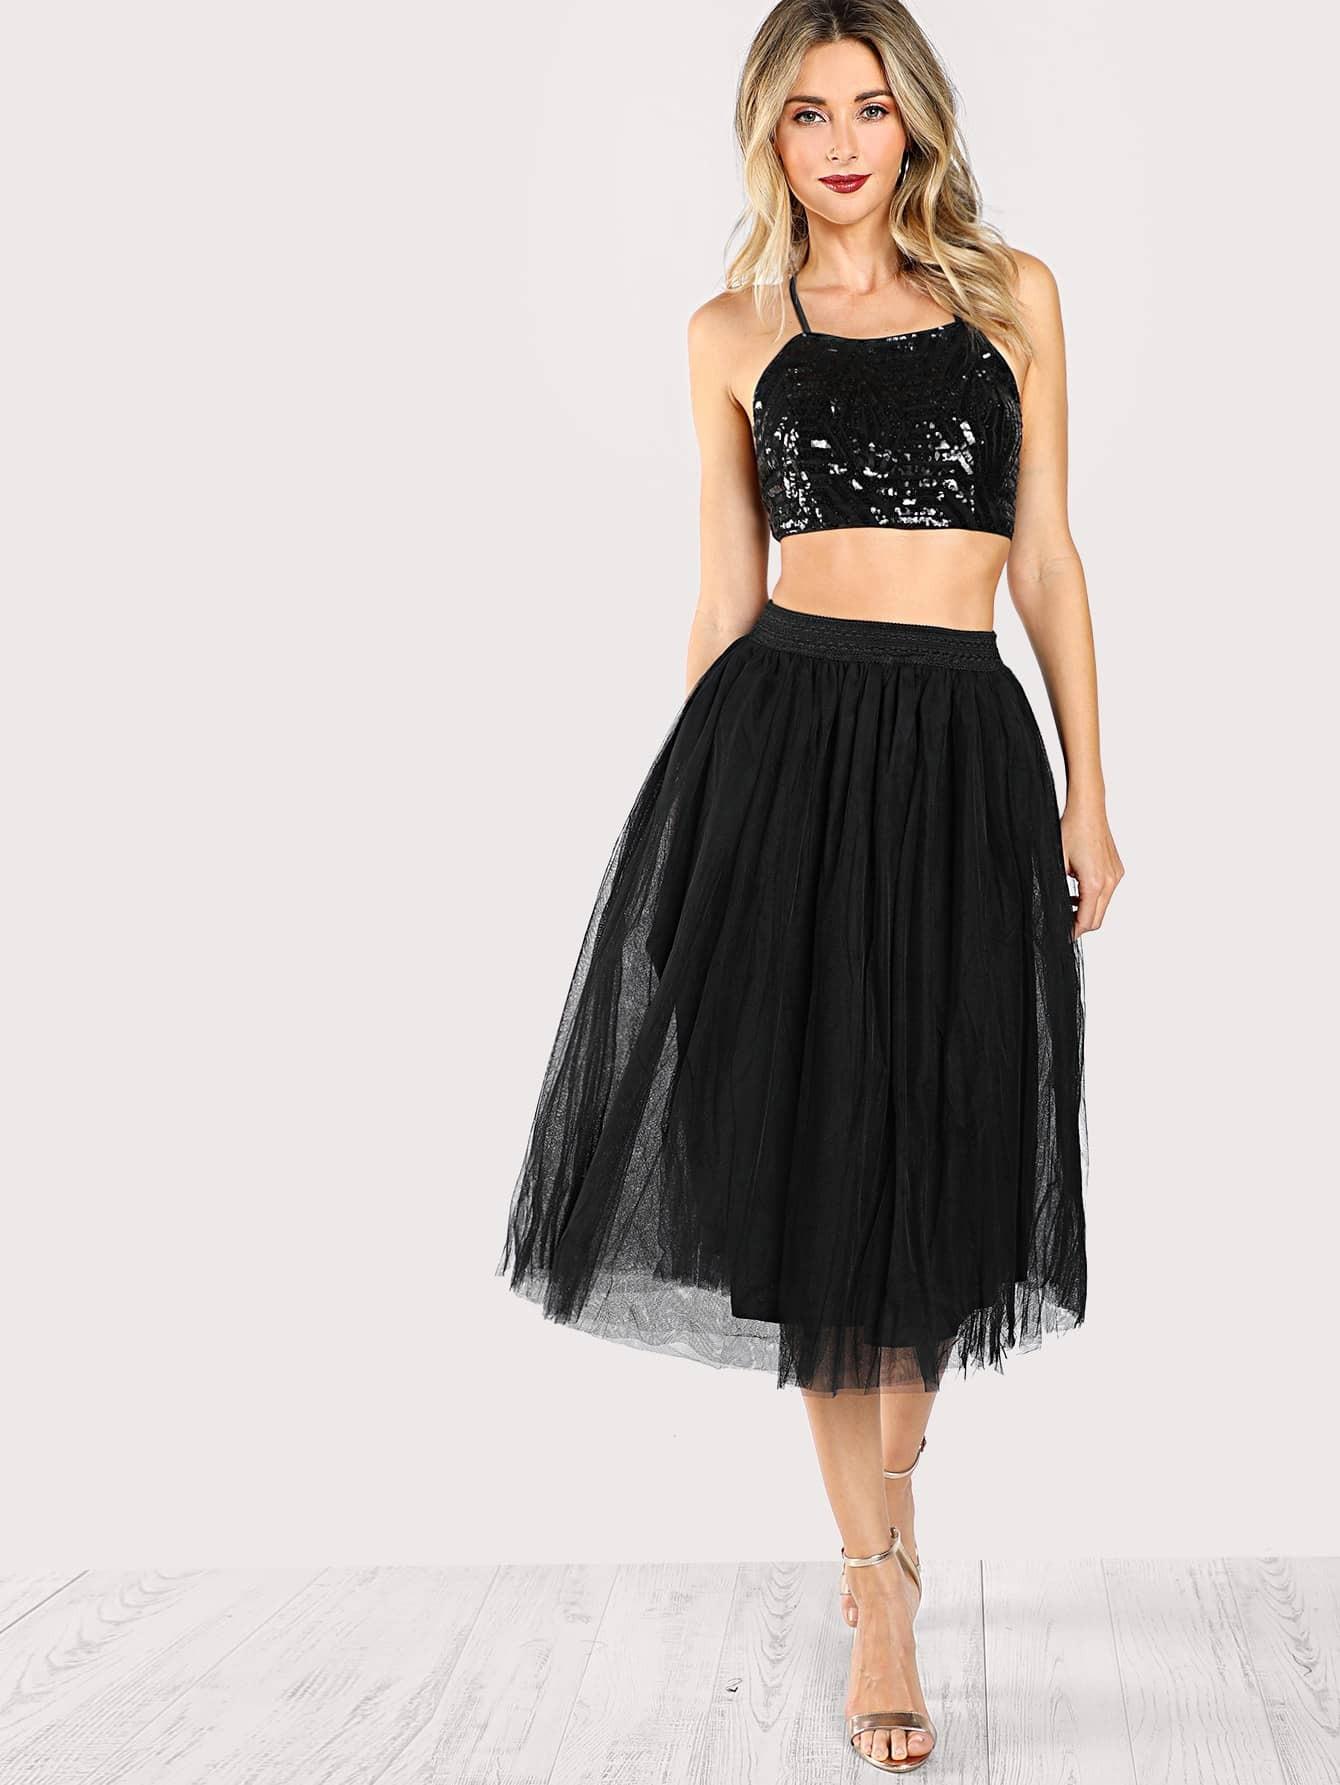 1867e6cf64 Black Skirt And Crop Top Set – DACC